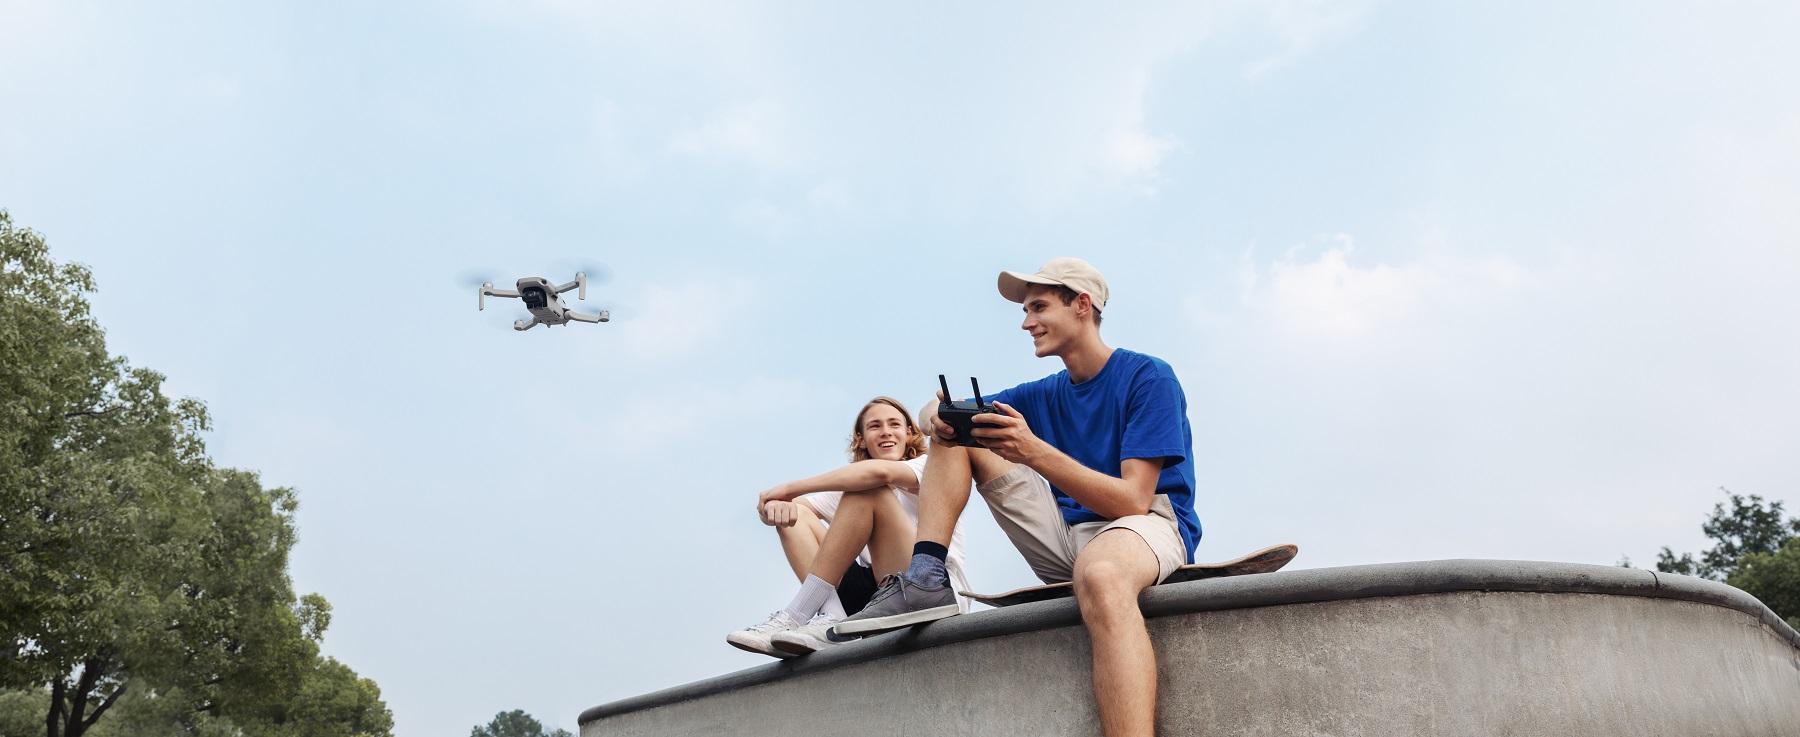 Die DJI Mavic Mini macht tolle Luftaufnahmen im Mini-Format